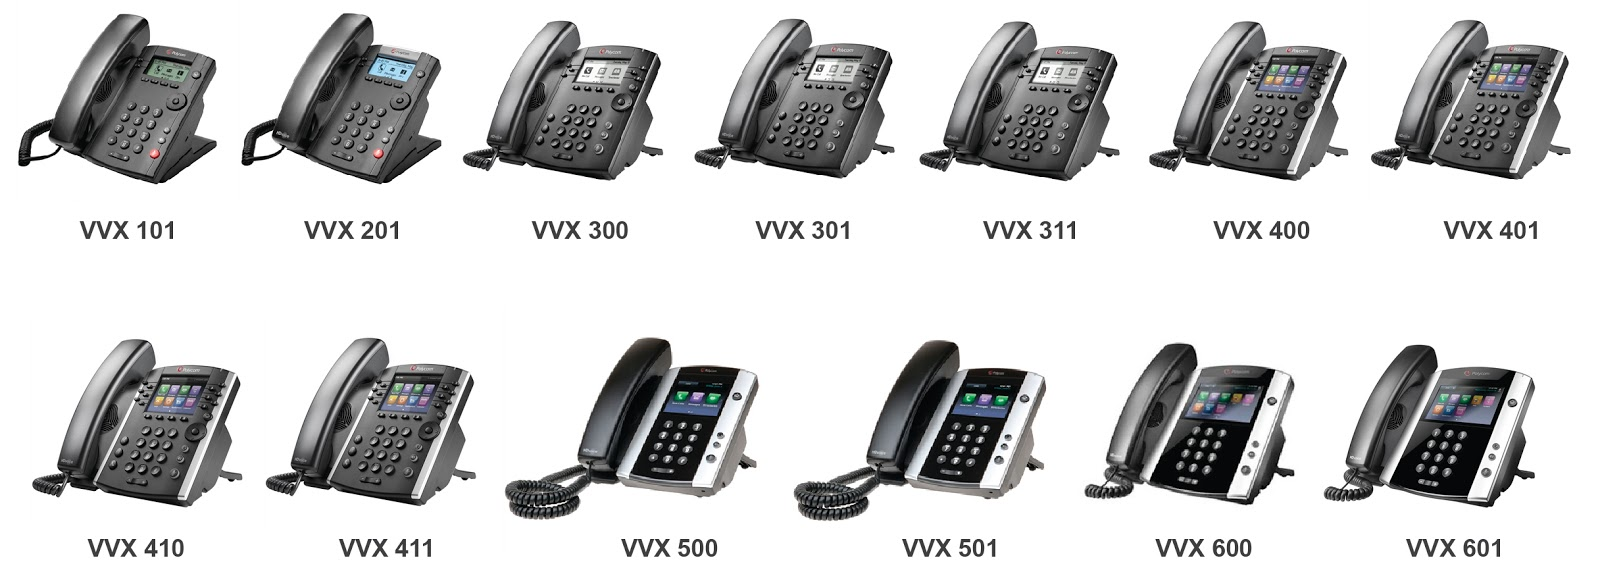 Reset a Polycom Phone